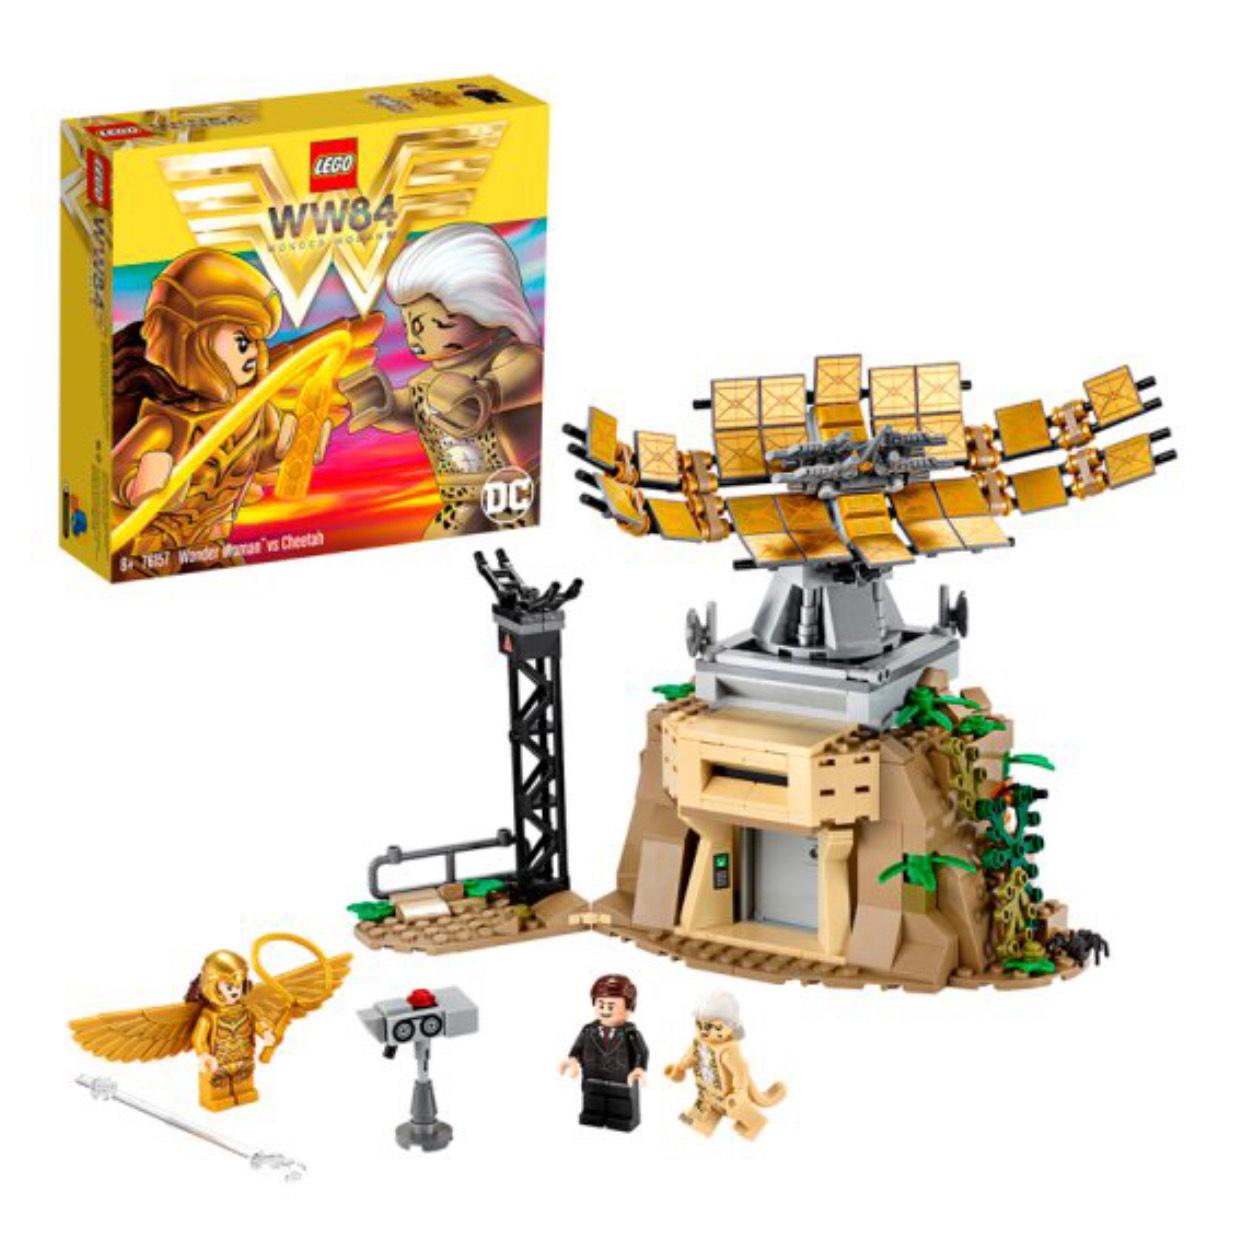 LEGO 76157 DC Super Heroes Wonder Woman vs Cheetah with Max Minifigures Building Set £17.50 at Amazon Prime (+£4.49 Non Prime)